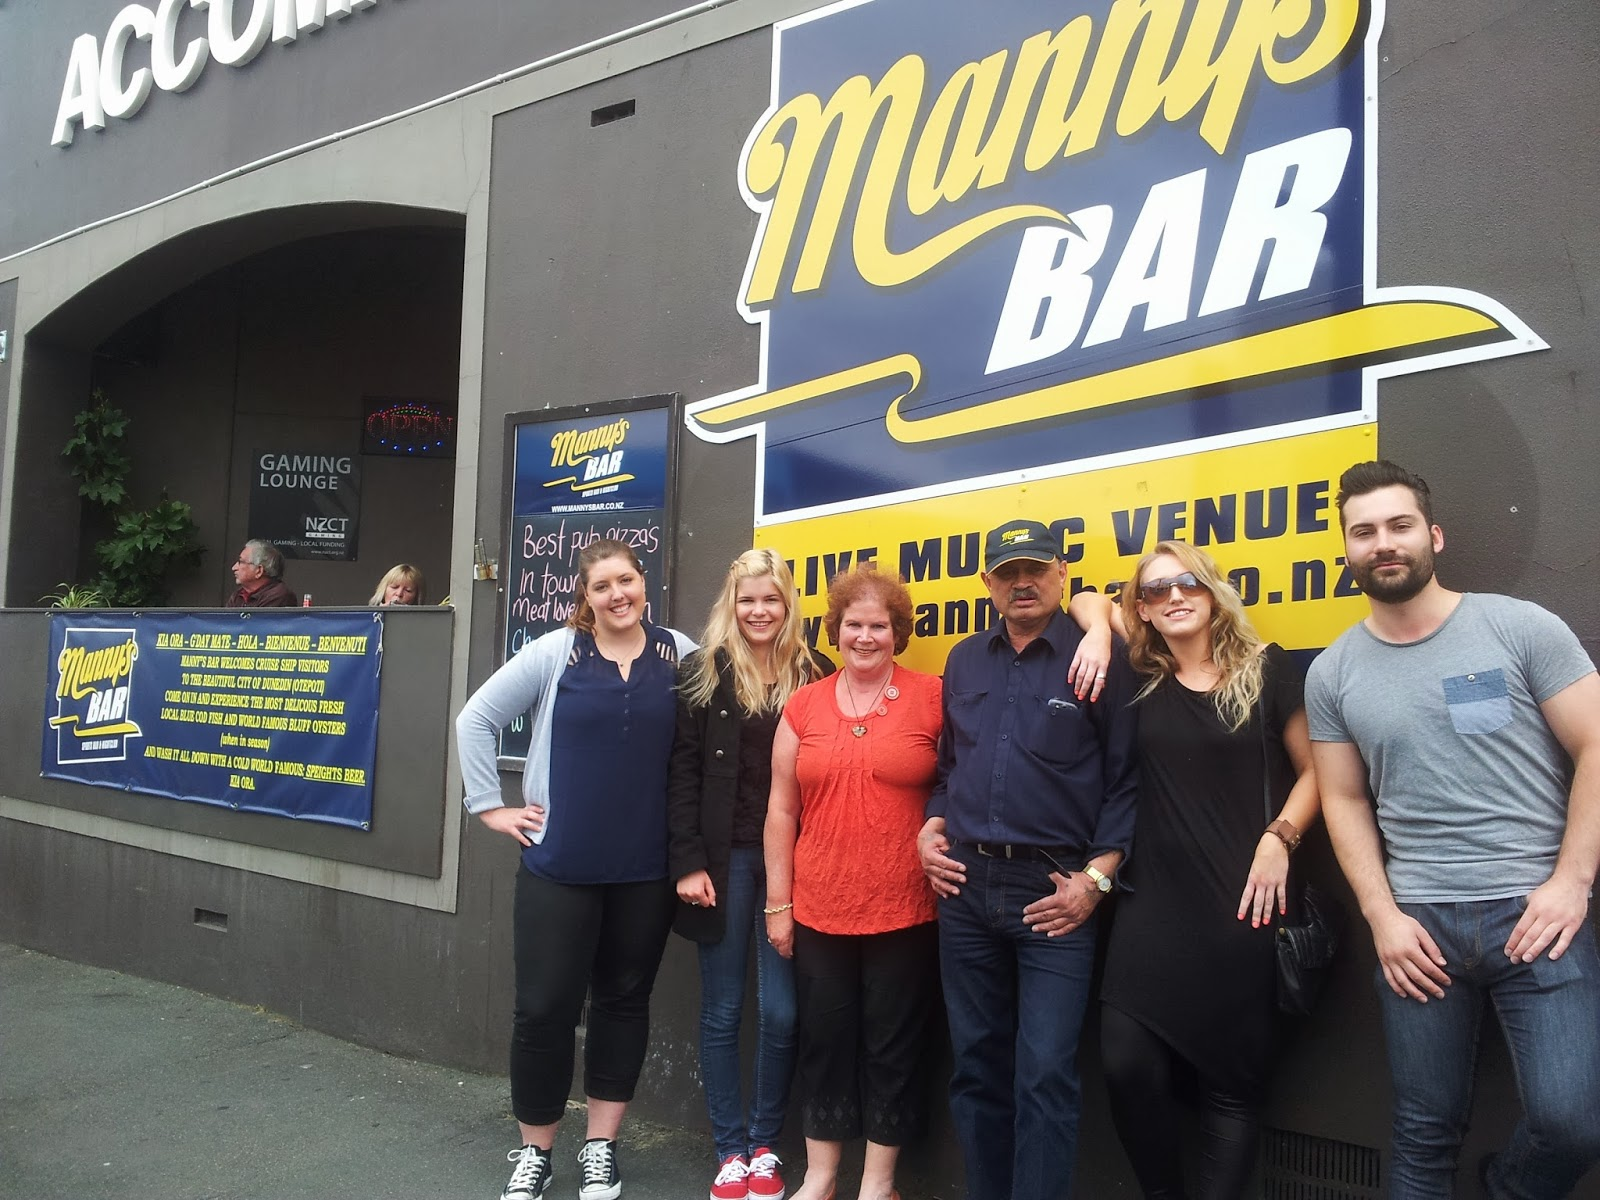 Mannys Bar